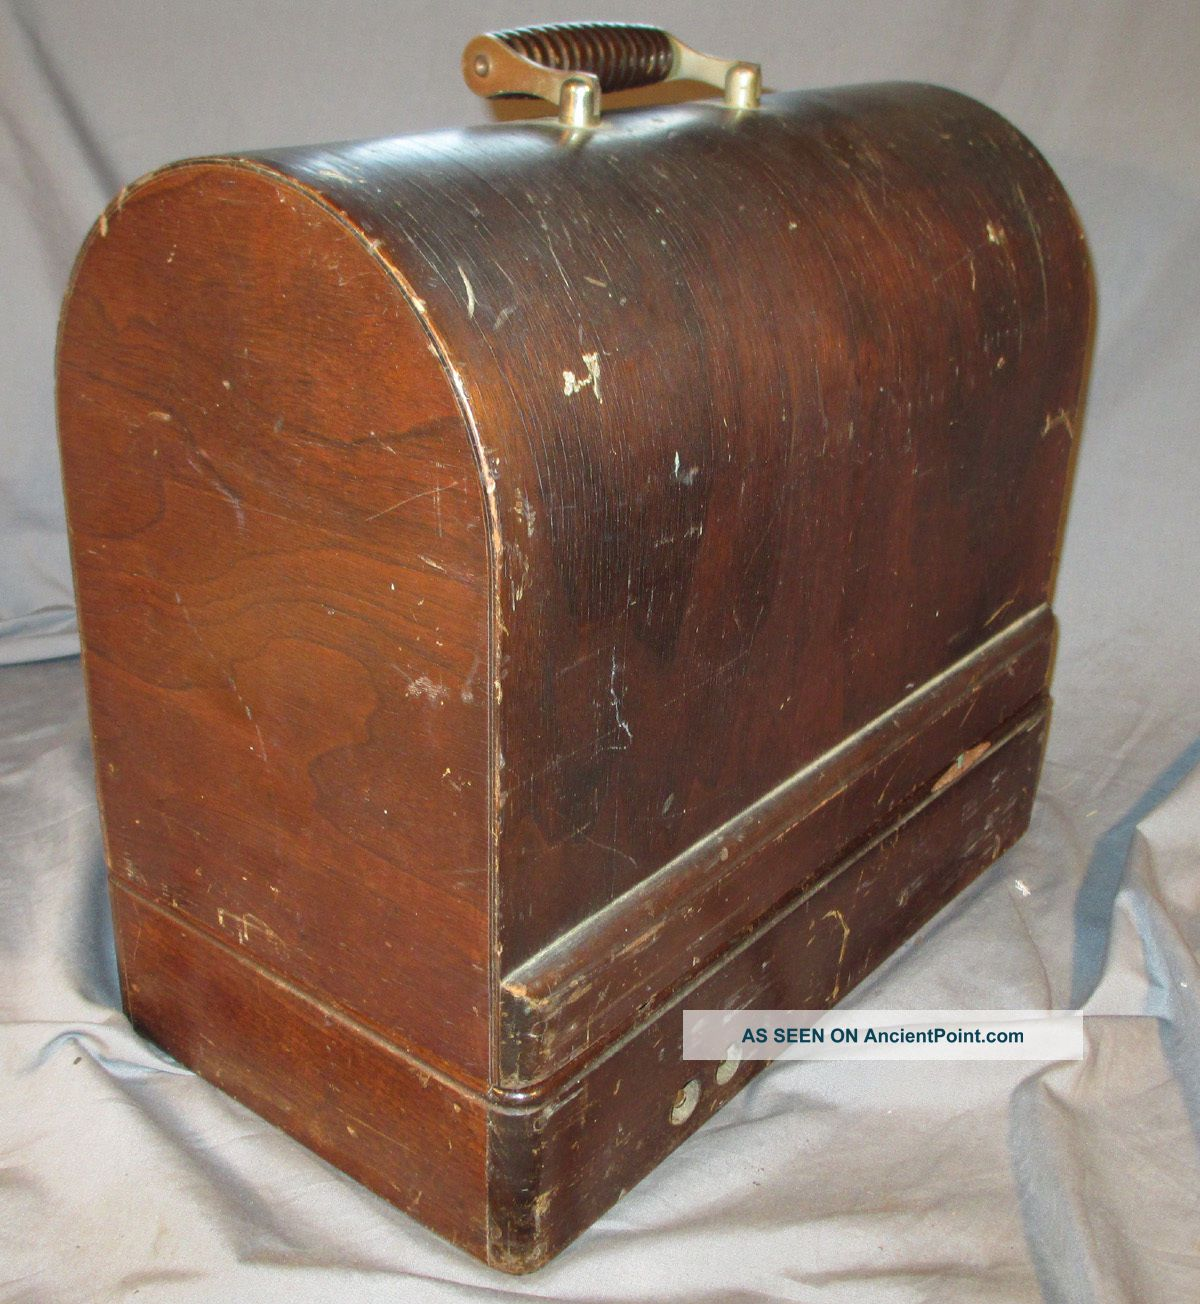 1923 singer sewing machine value